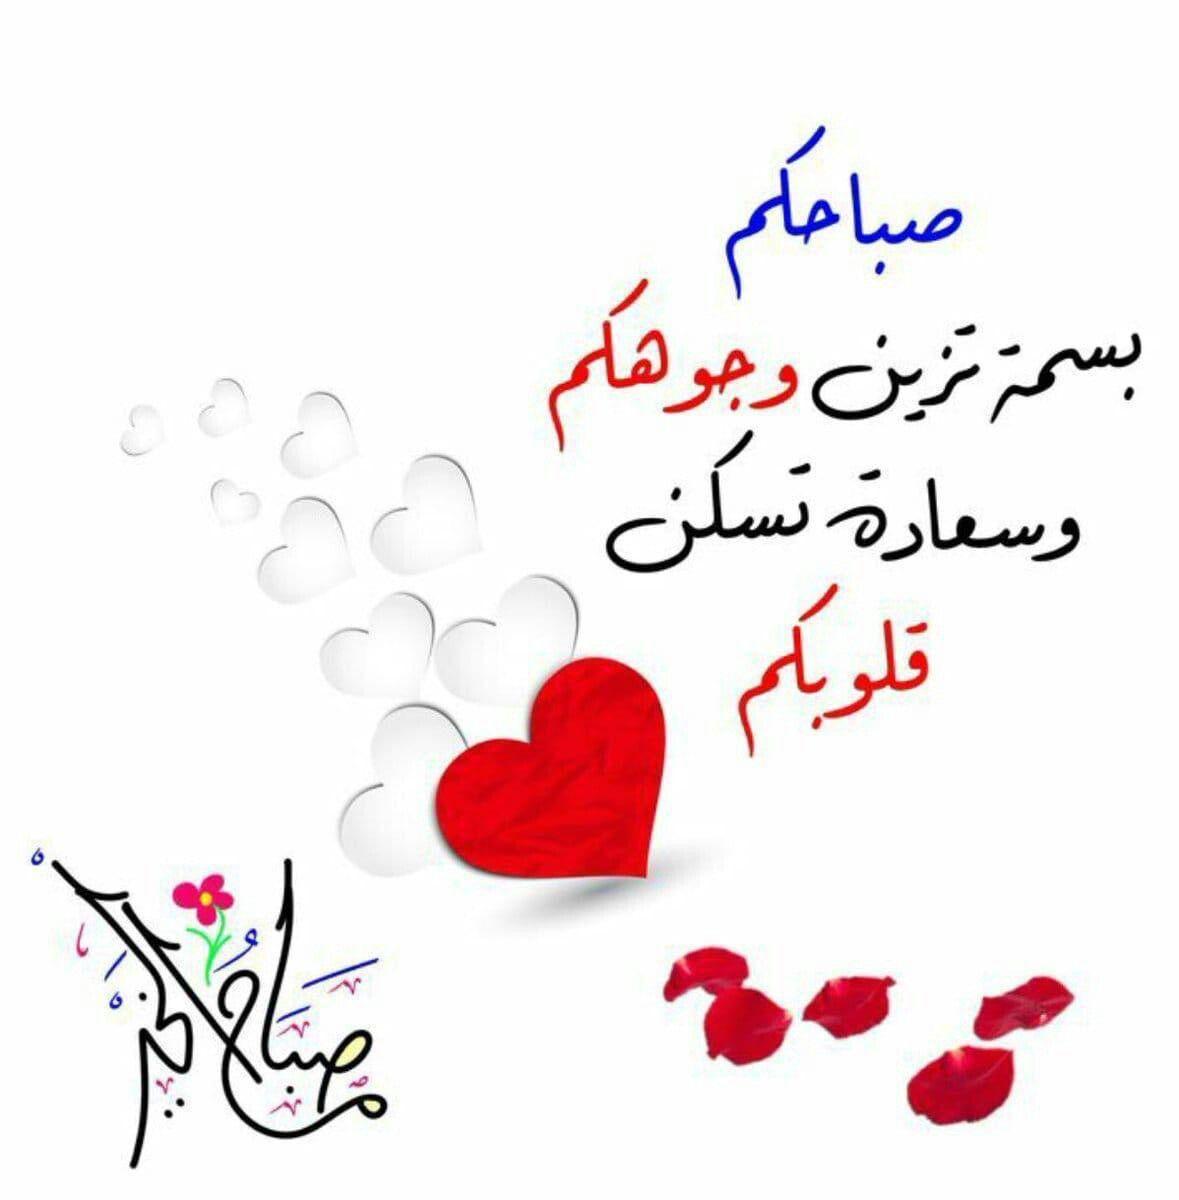 Pin By Souad Ramzi On صباح مساء الخير Good Morning Arabic Morning Quotes Images Good Morning Greetings